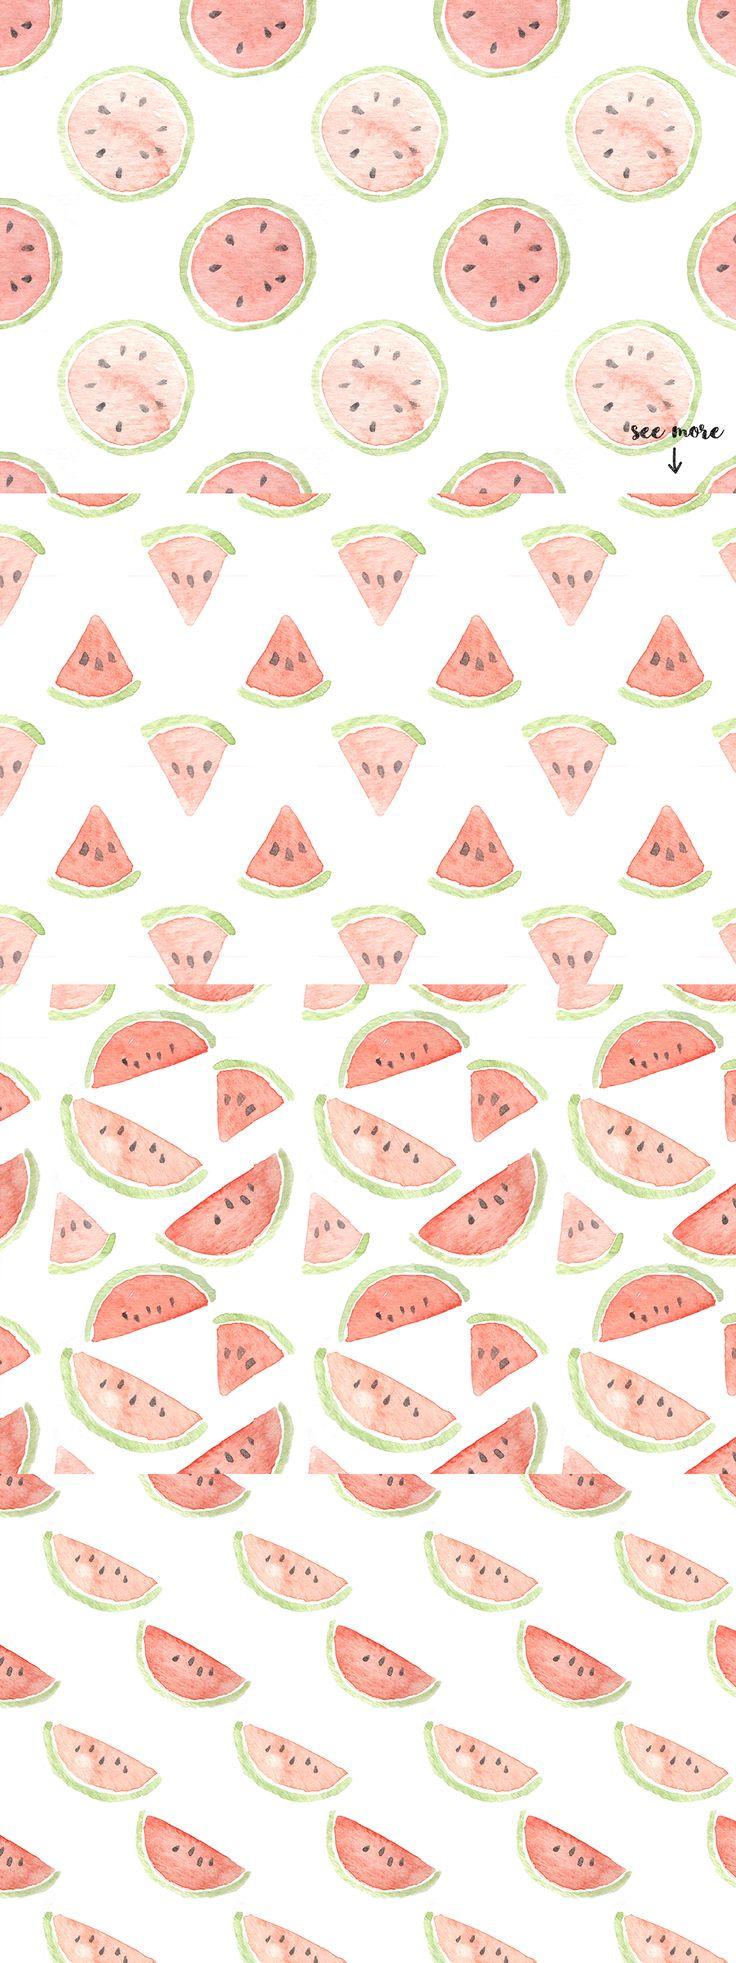 10 Watermelon Patterns by everysunsun on @creativemarket